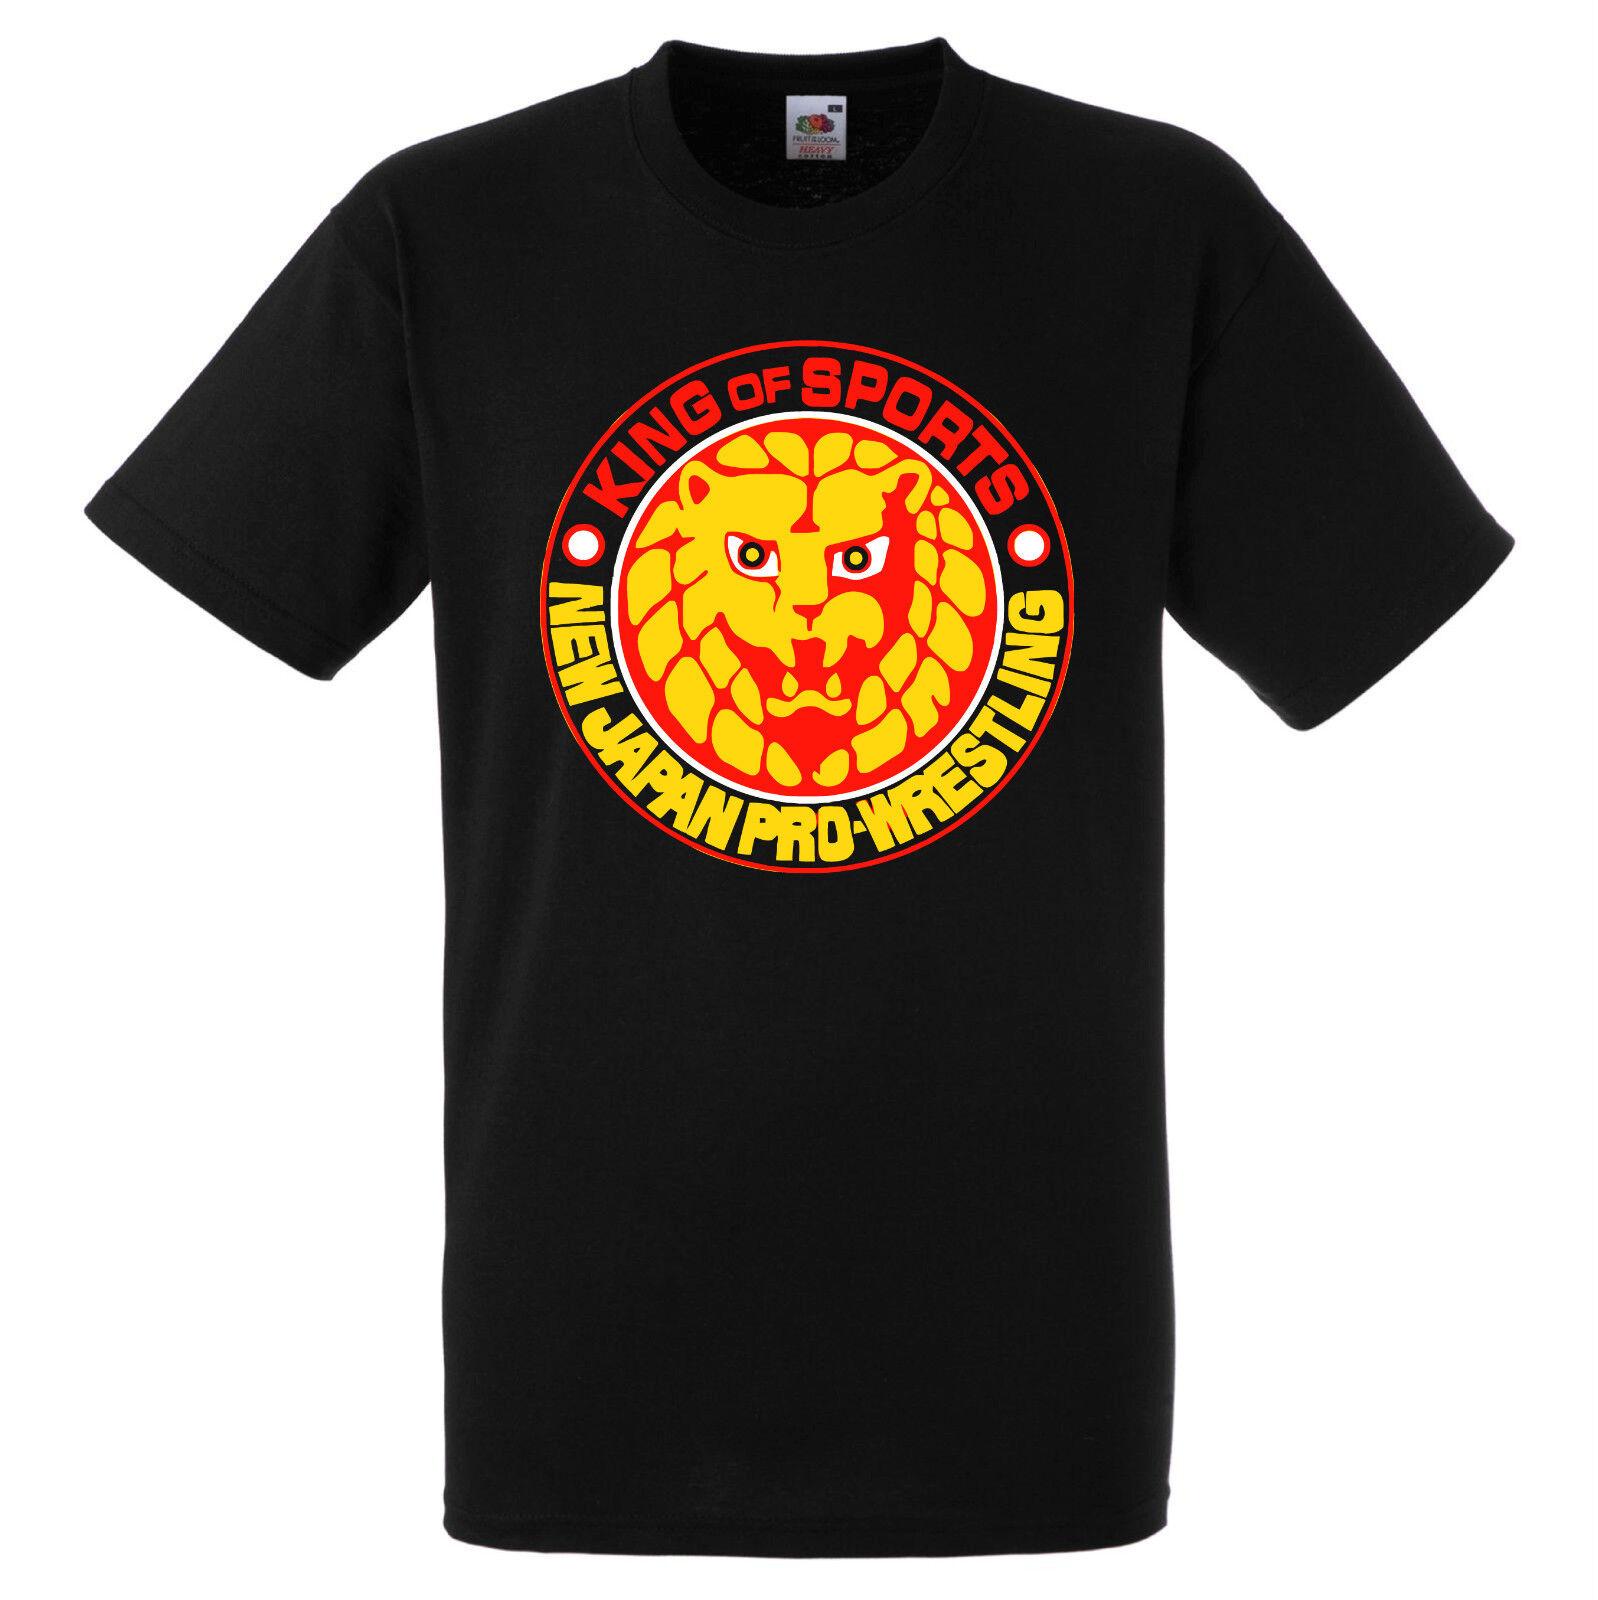 NJPW NEW JAPAN PRO WRESTLING logo Bullet Club AJ Styles t-shirt mens S to 3XL